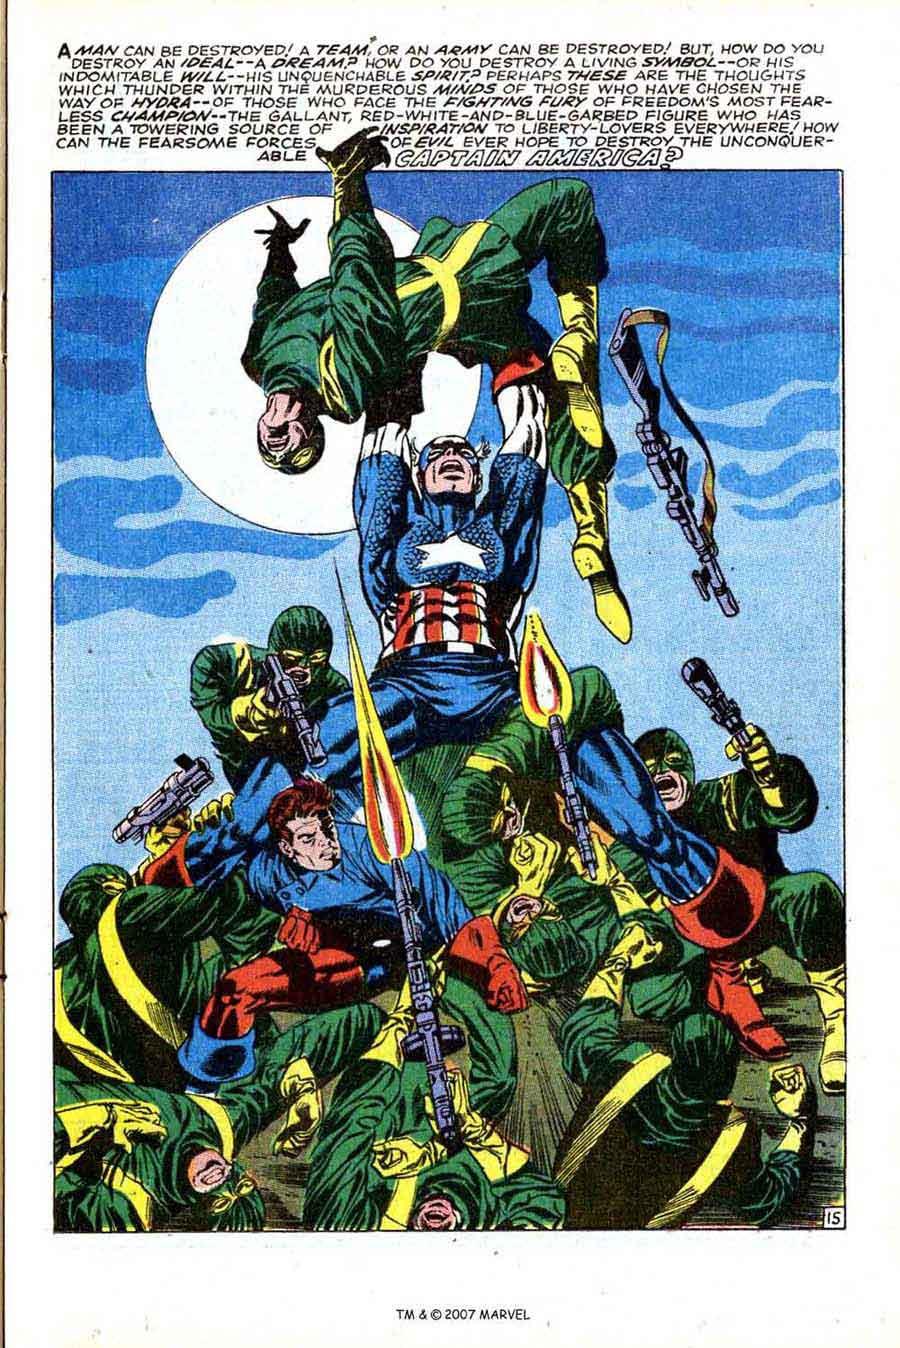 Captain America v1 #113 marvel comic book page art by Jim Steranko